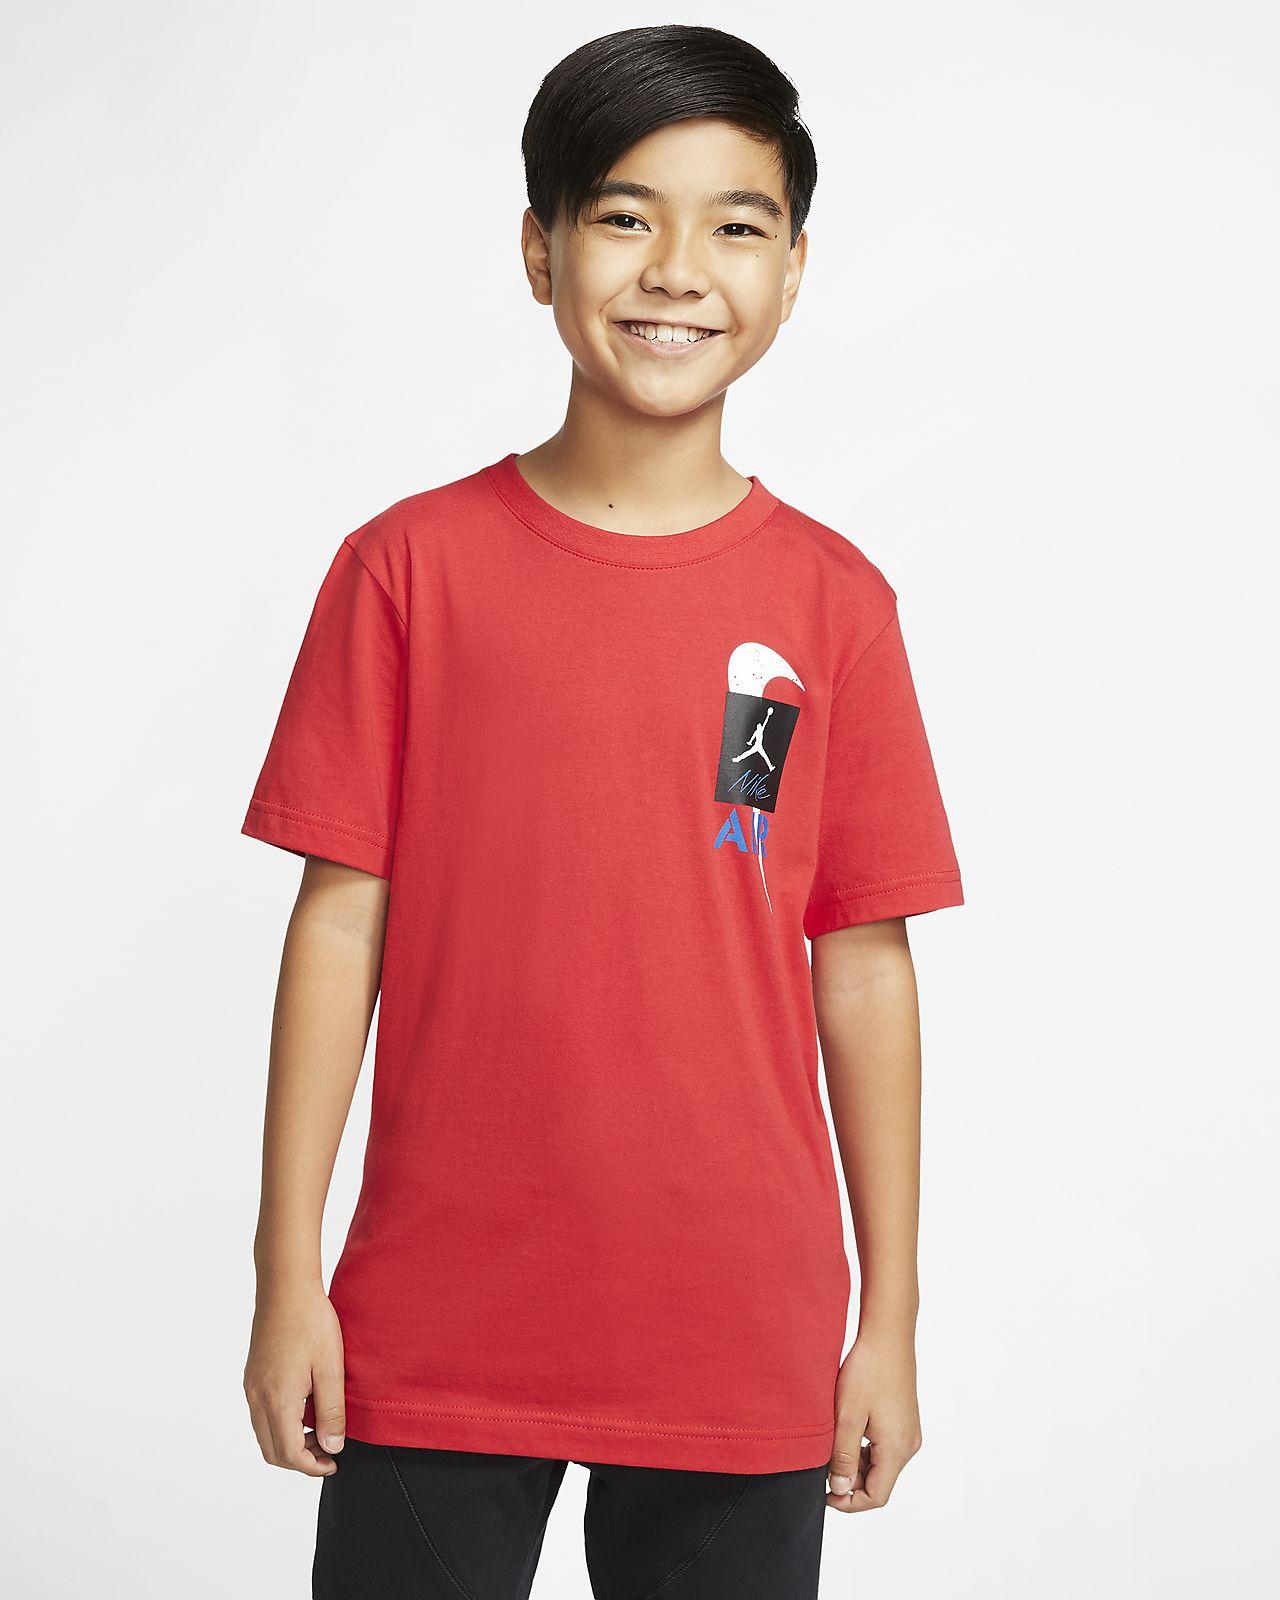 Air Jordan Older Kids' (Boys') Short-Sleeve T-Shirt